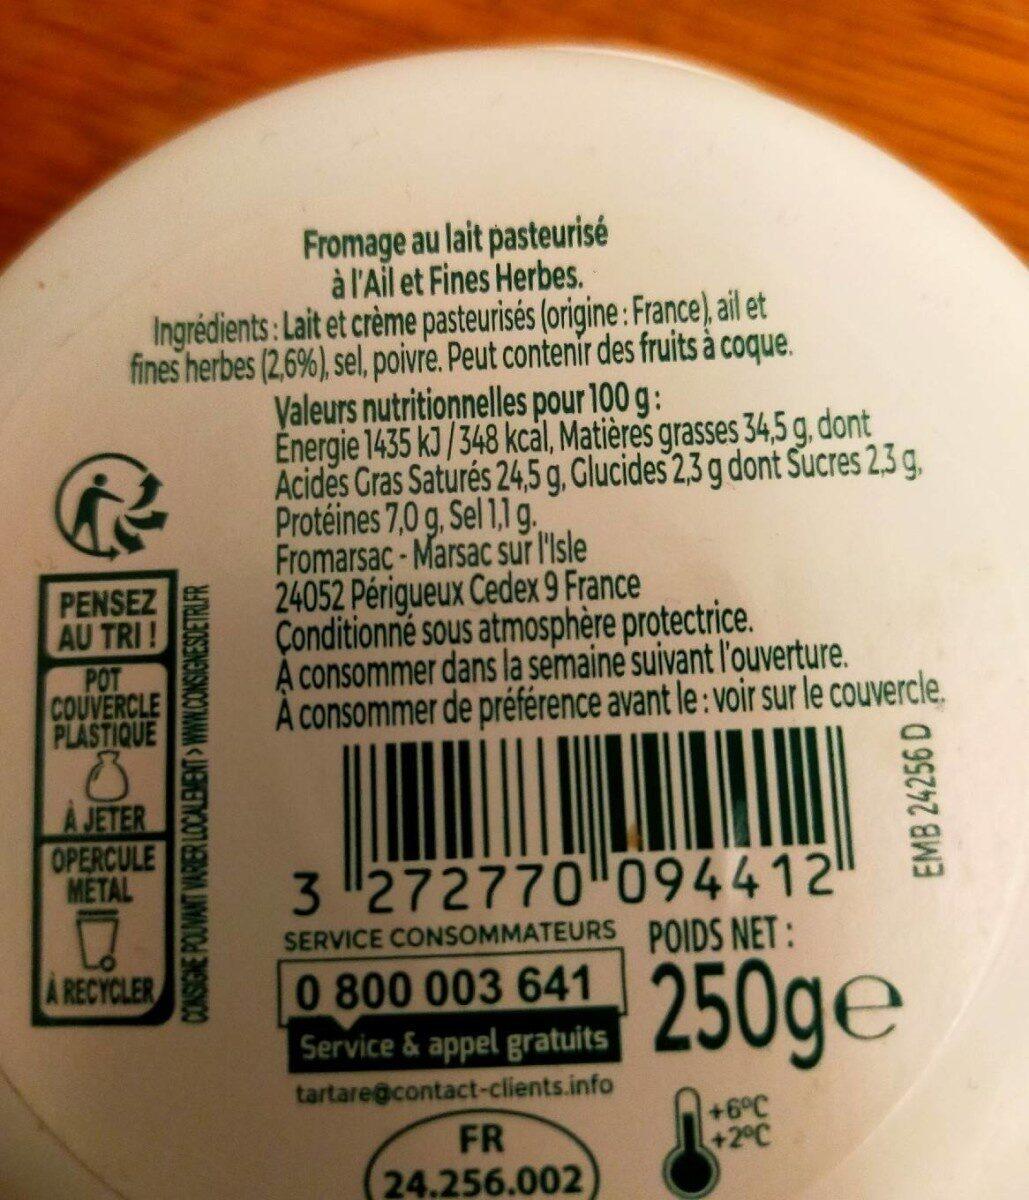 L'original tartare ail & fines herbes - Valori nutrizionali - fr